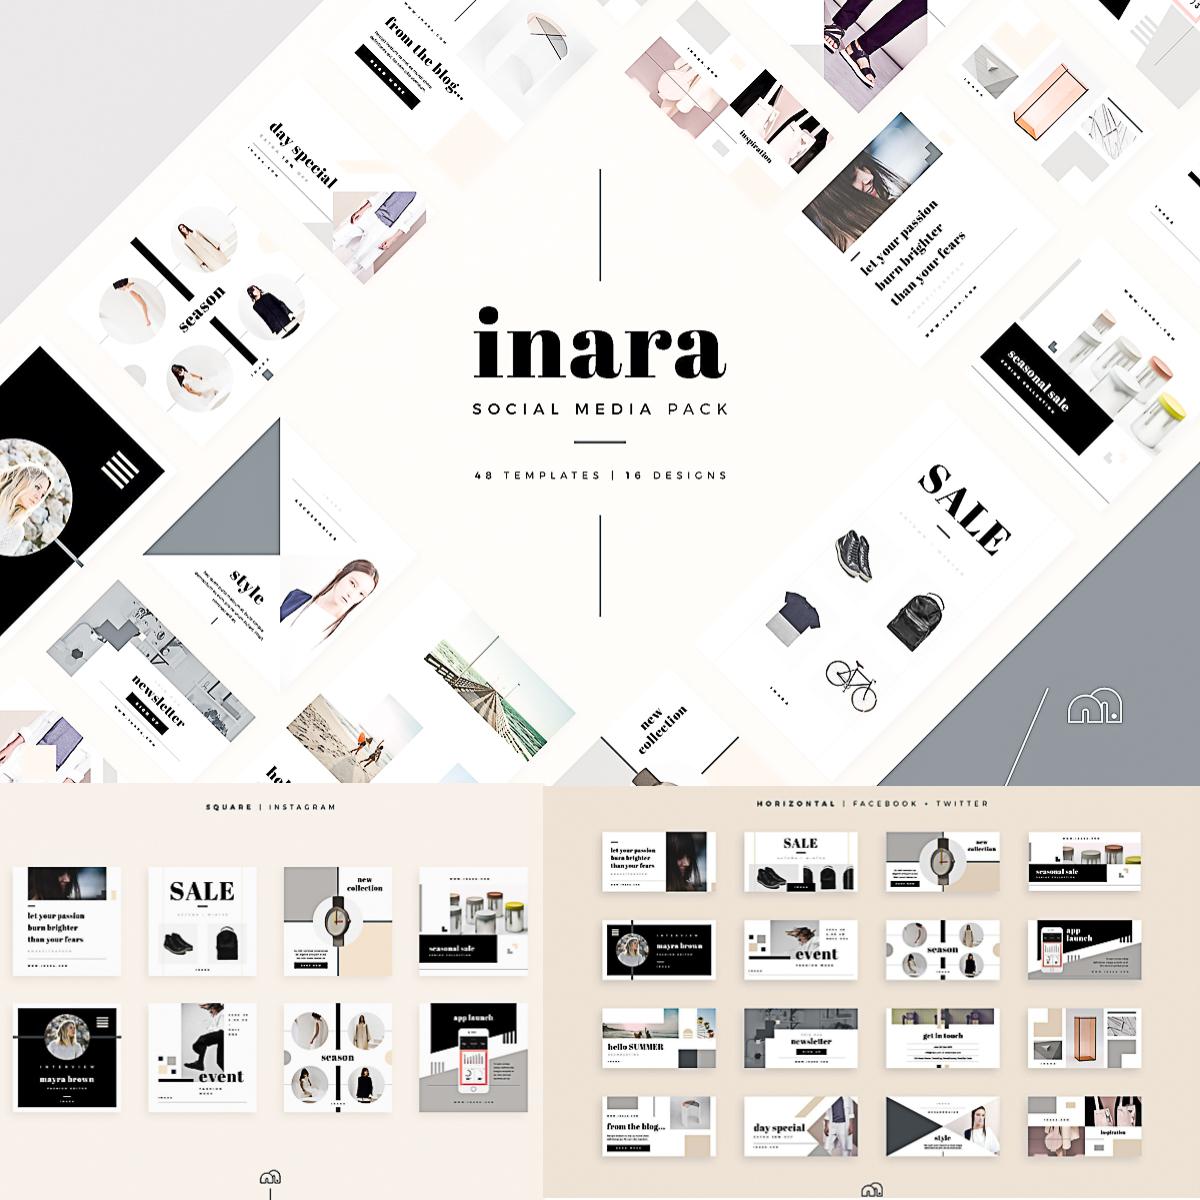 inara social media templates - Social Media Templates Free